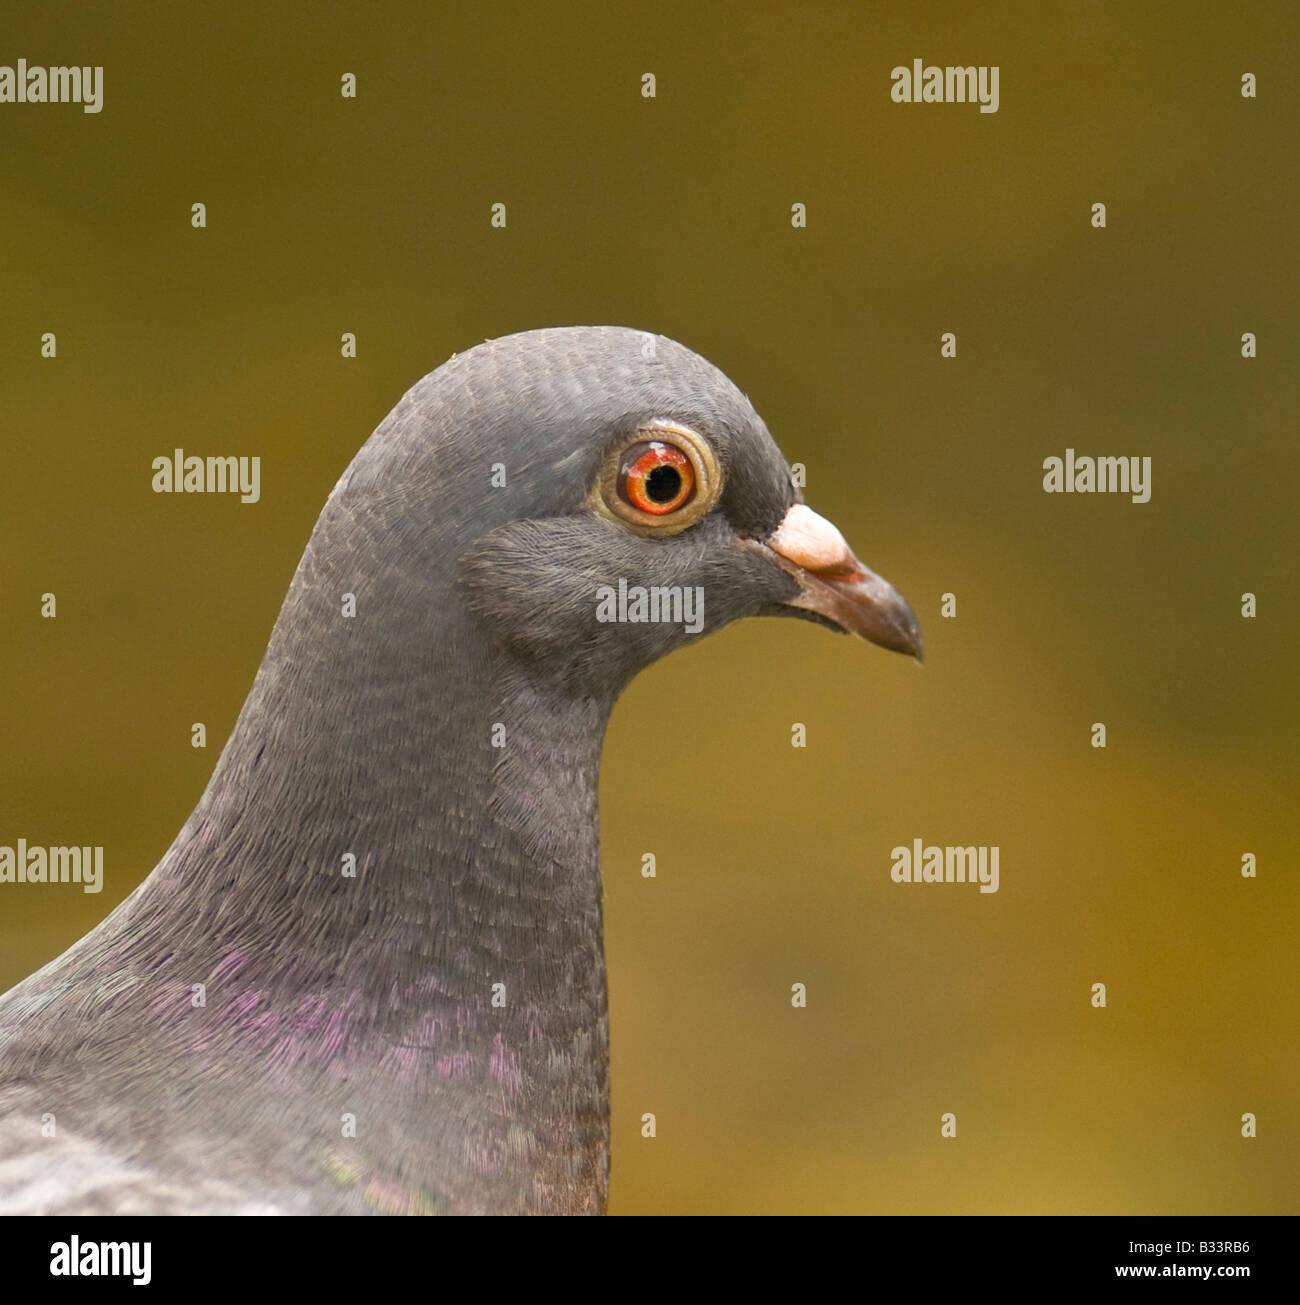 "Pigeon ""Columadea"" posing for the camera. - Stock Image"